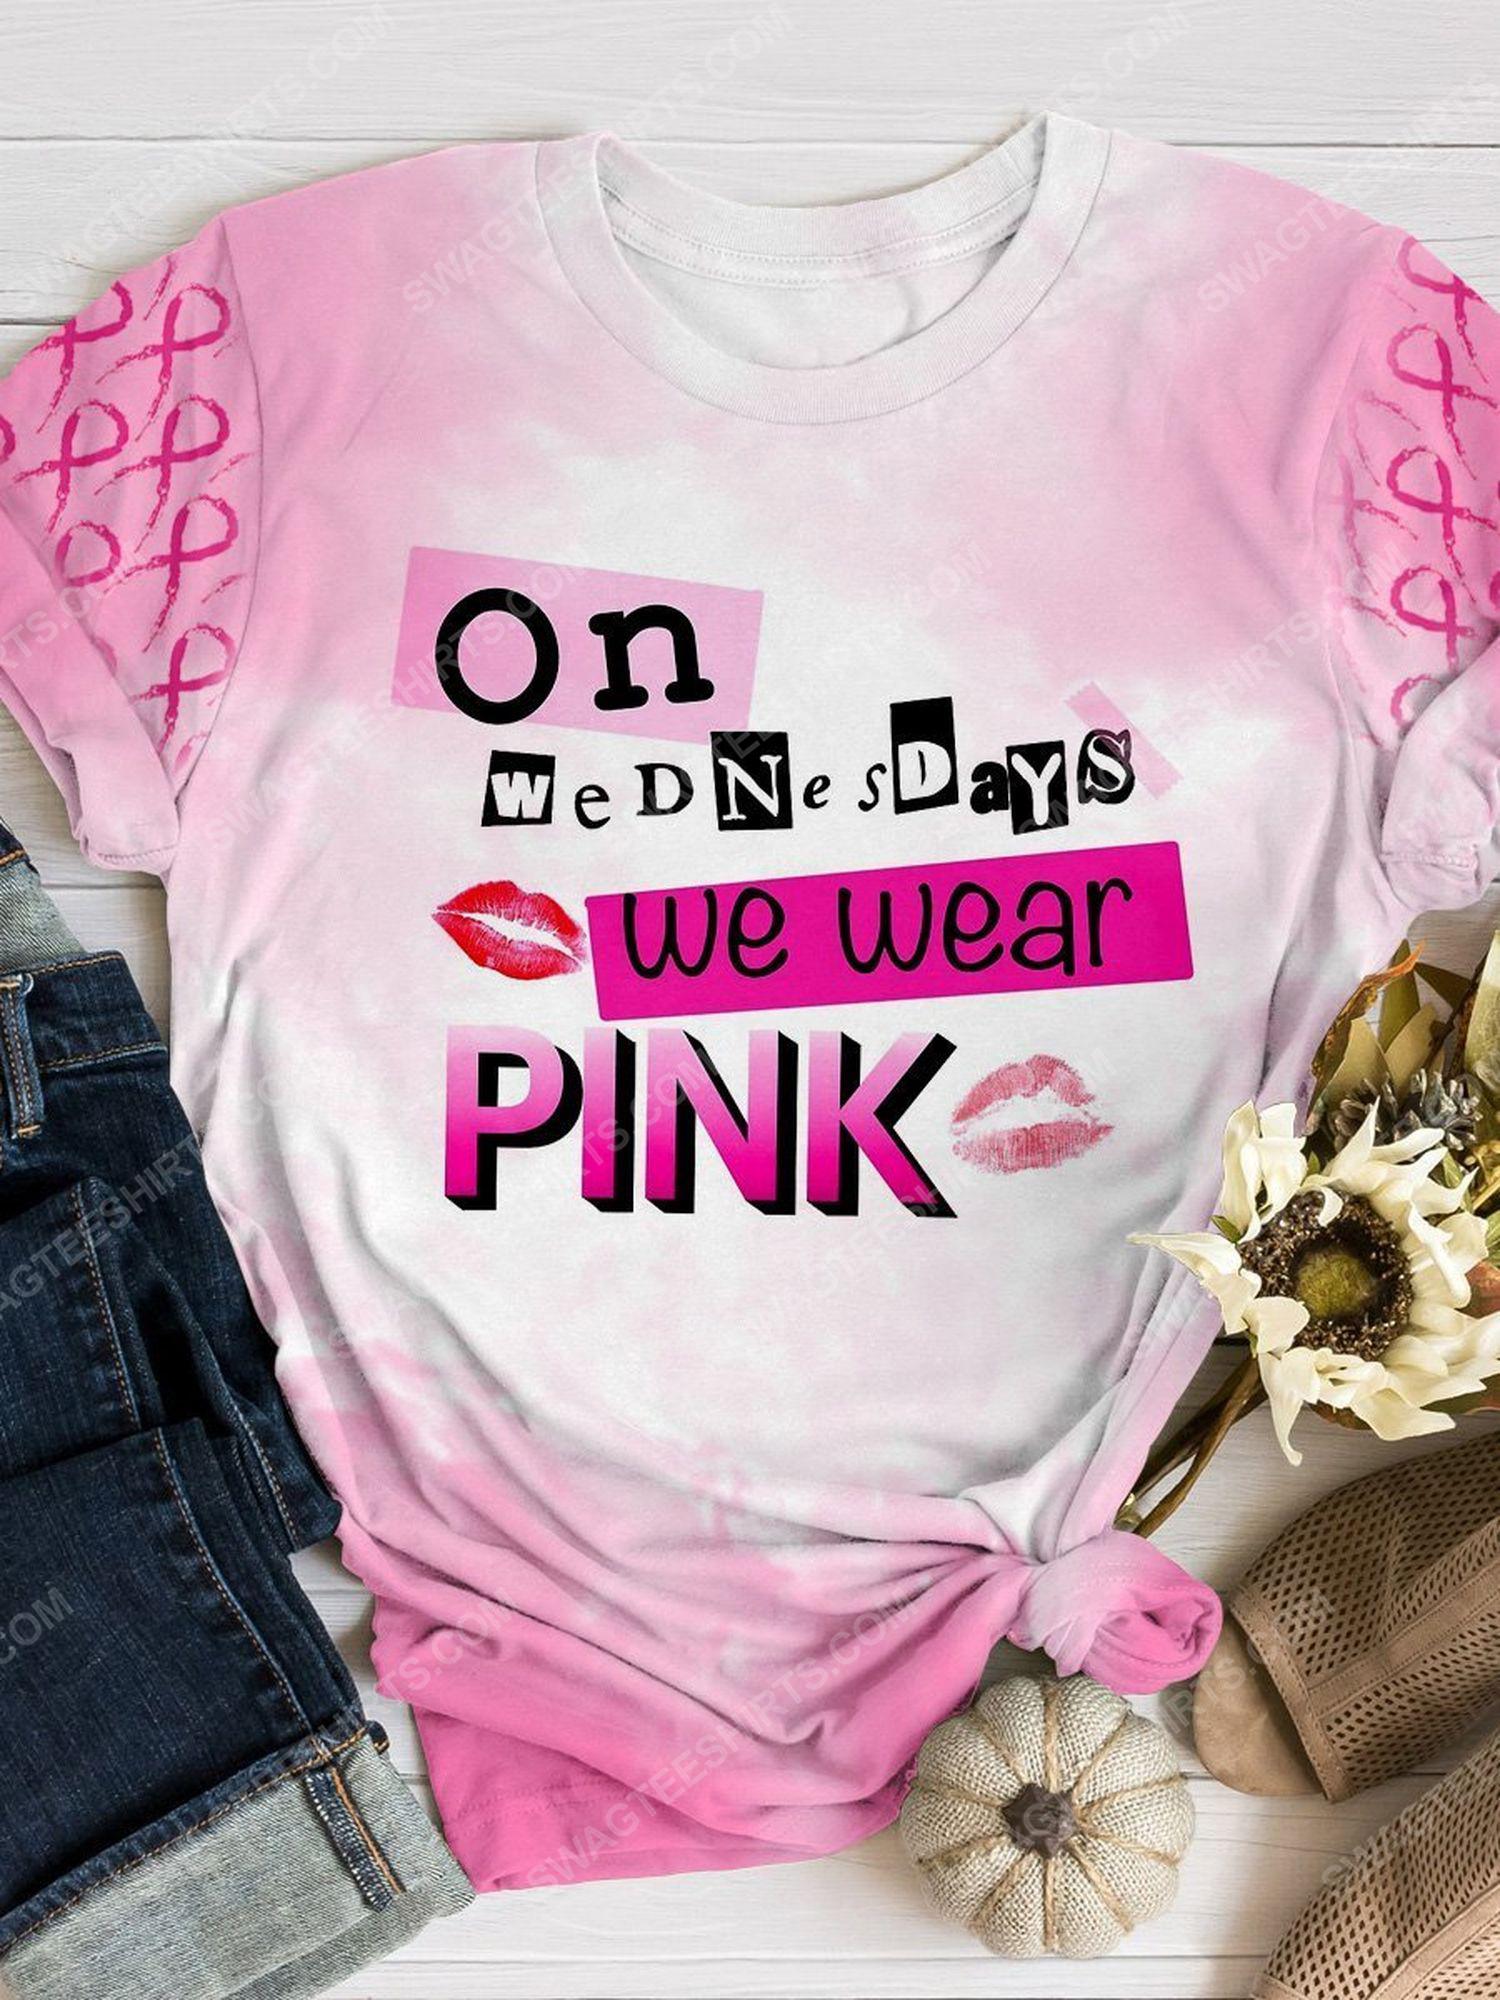 Breast cancer awareness on wednesdays we wear pink shirt